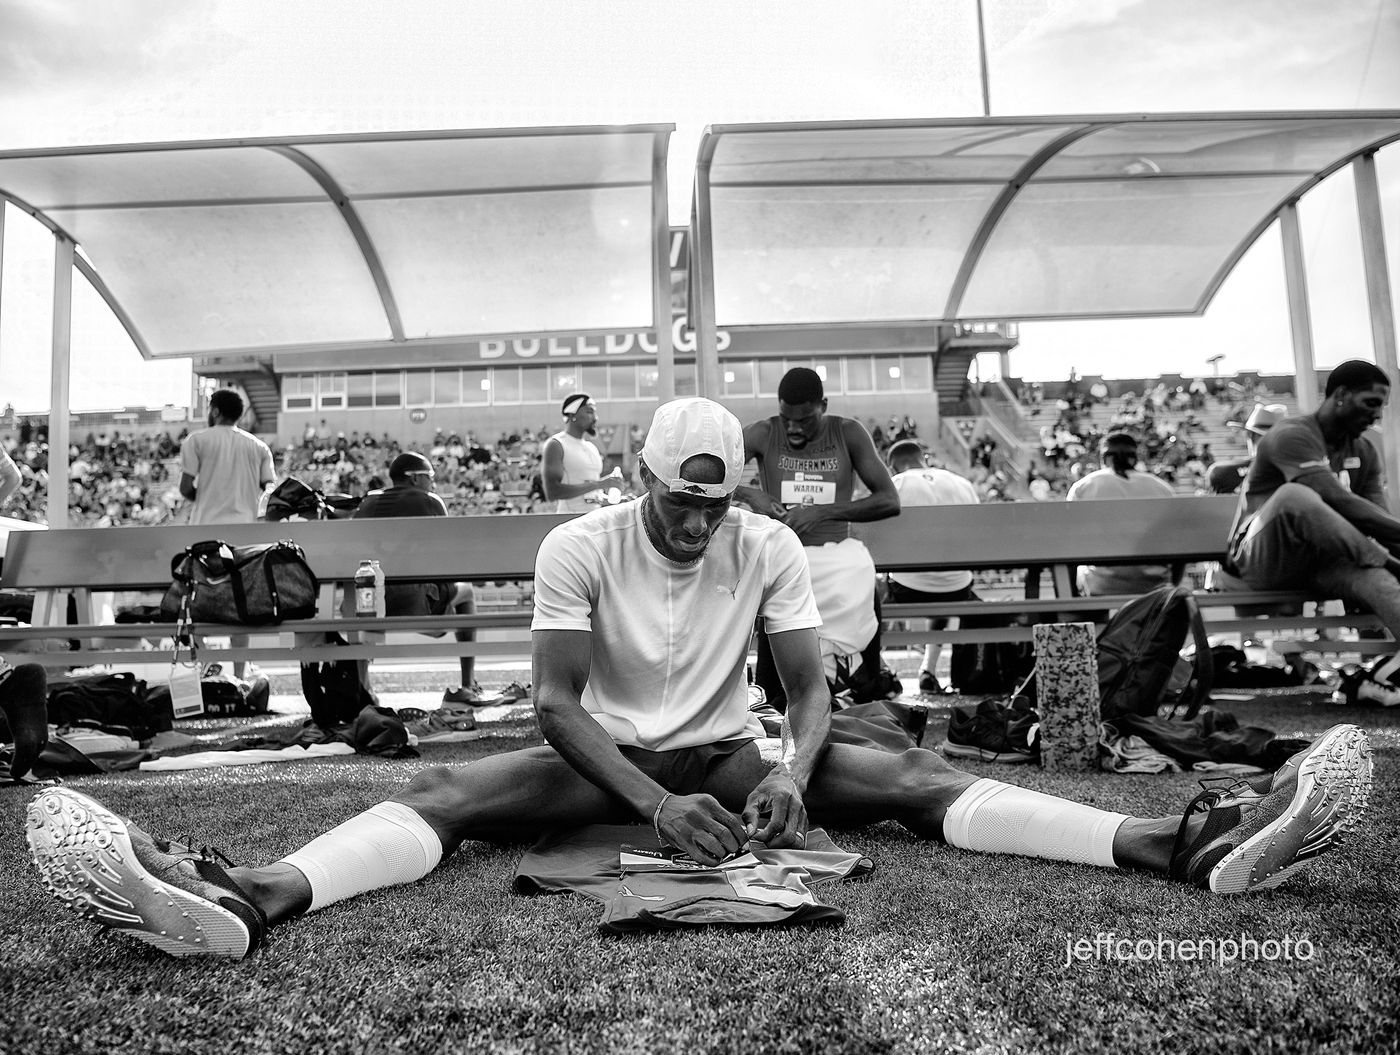 2019-USATF-Outdoor-Champs-day-2-claye-tjm-bw--4220---jeff-cohen-photo--web.jpg